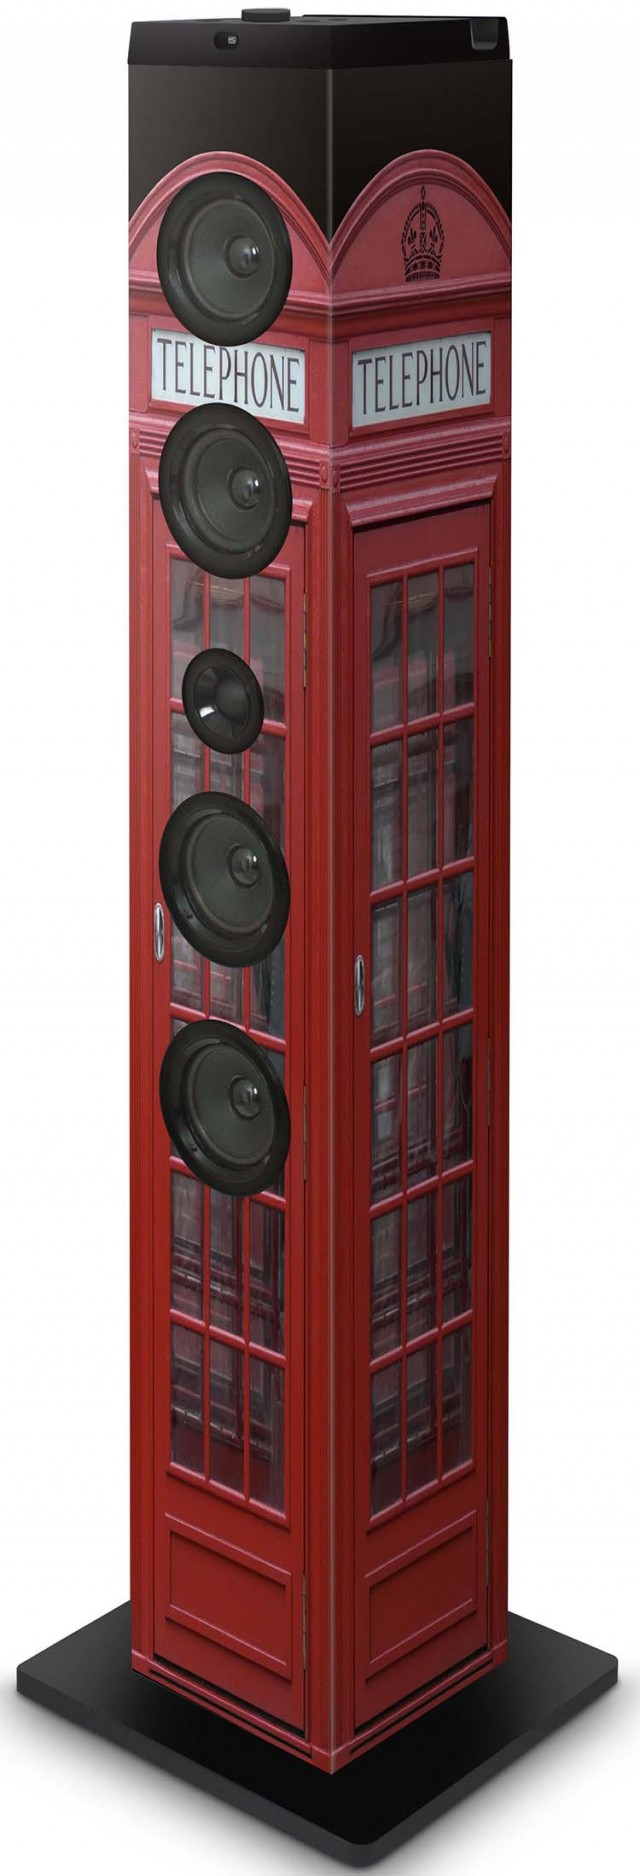 "Multimedia tower ""British cab"" - Packshot"